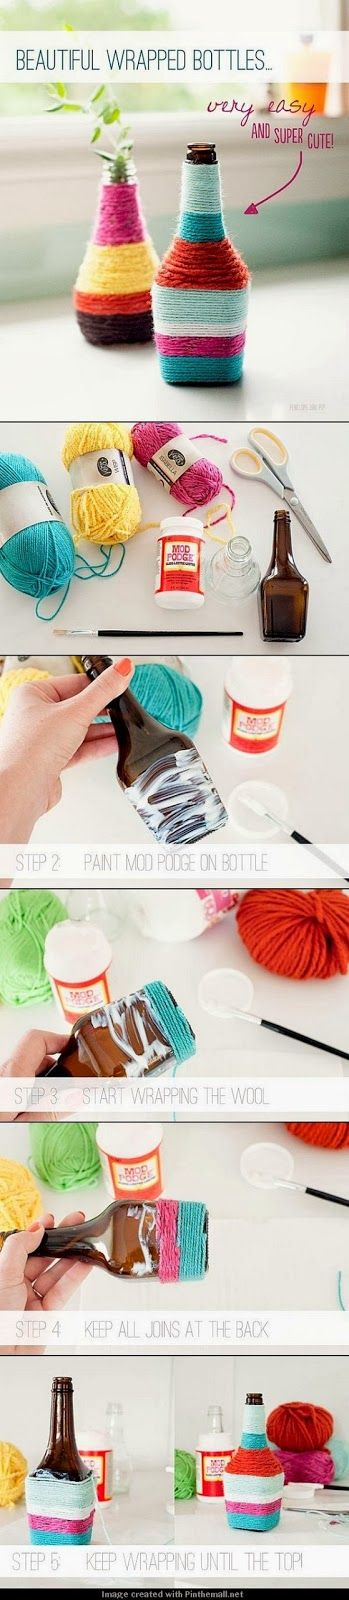 DIY-Home-Decor: Beautiful Wrapped Bottles DIY